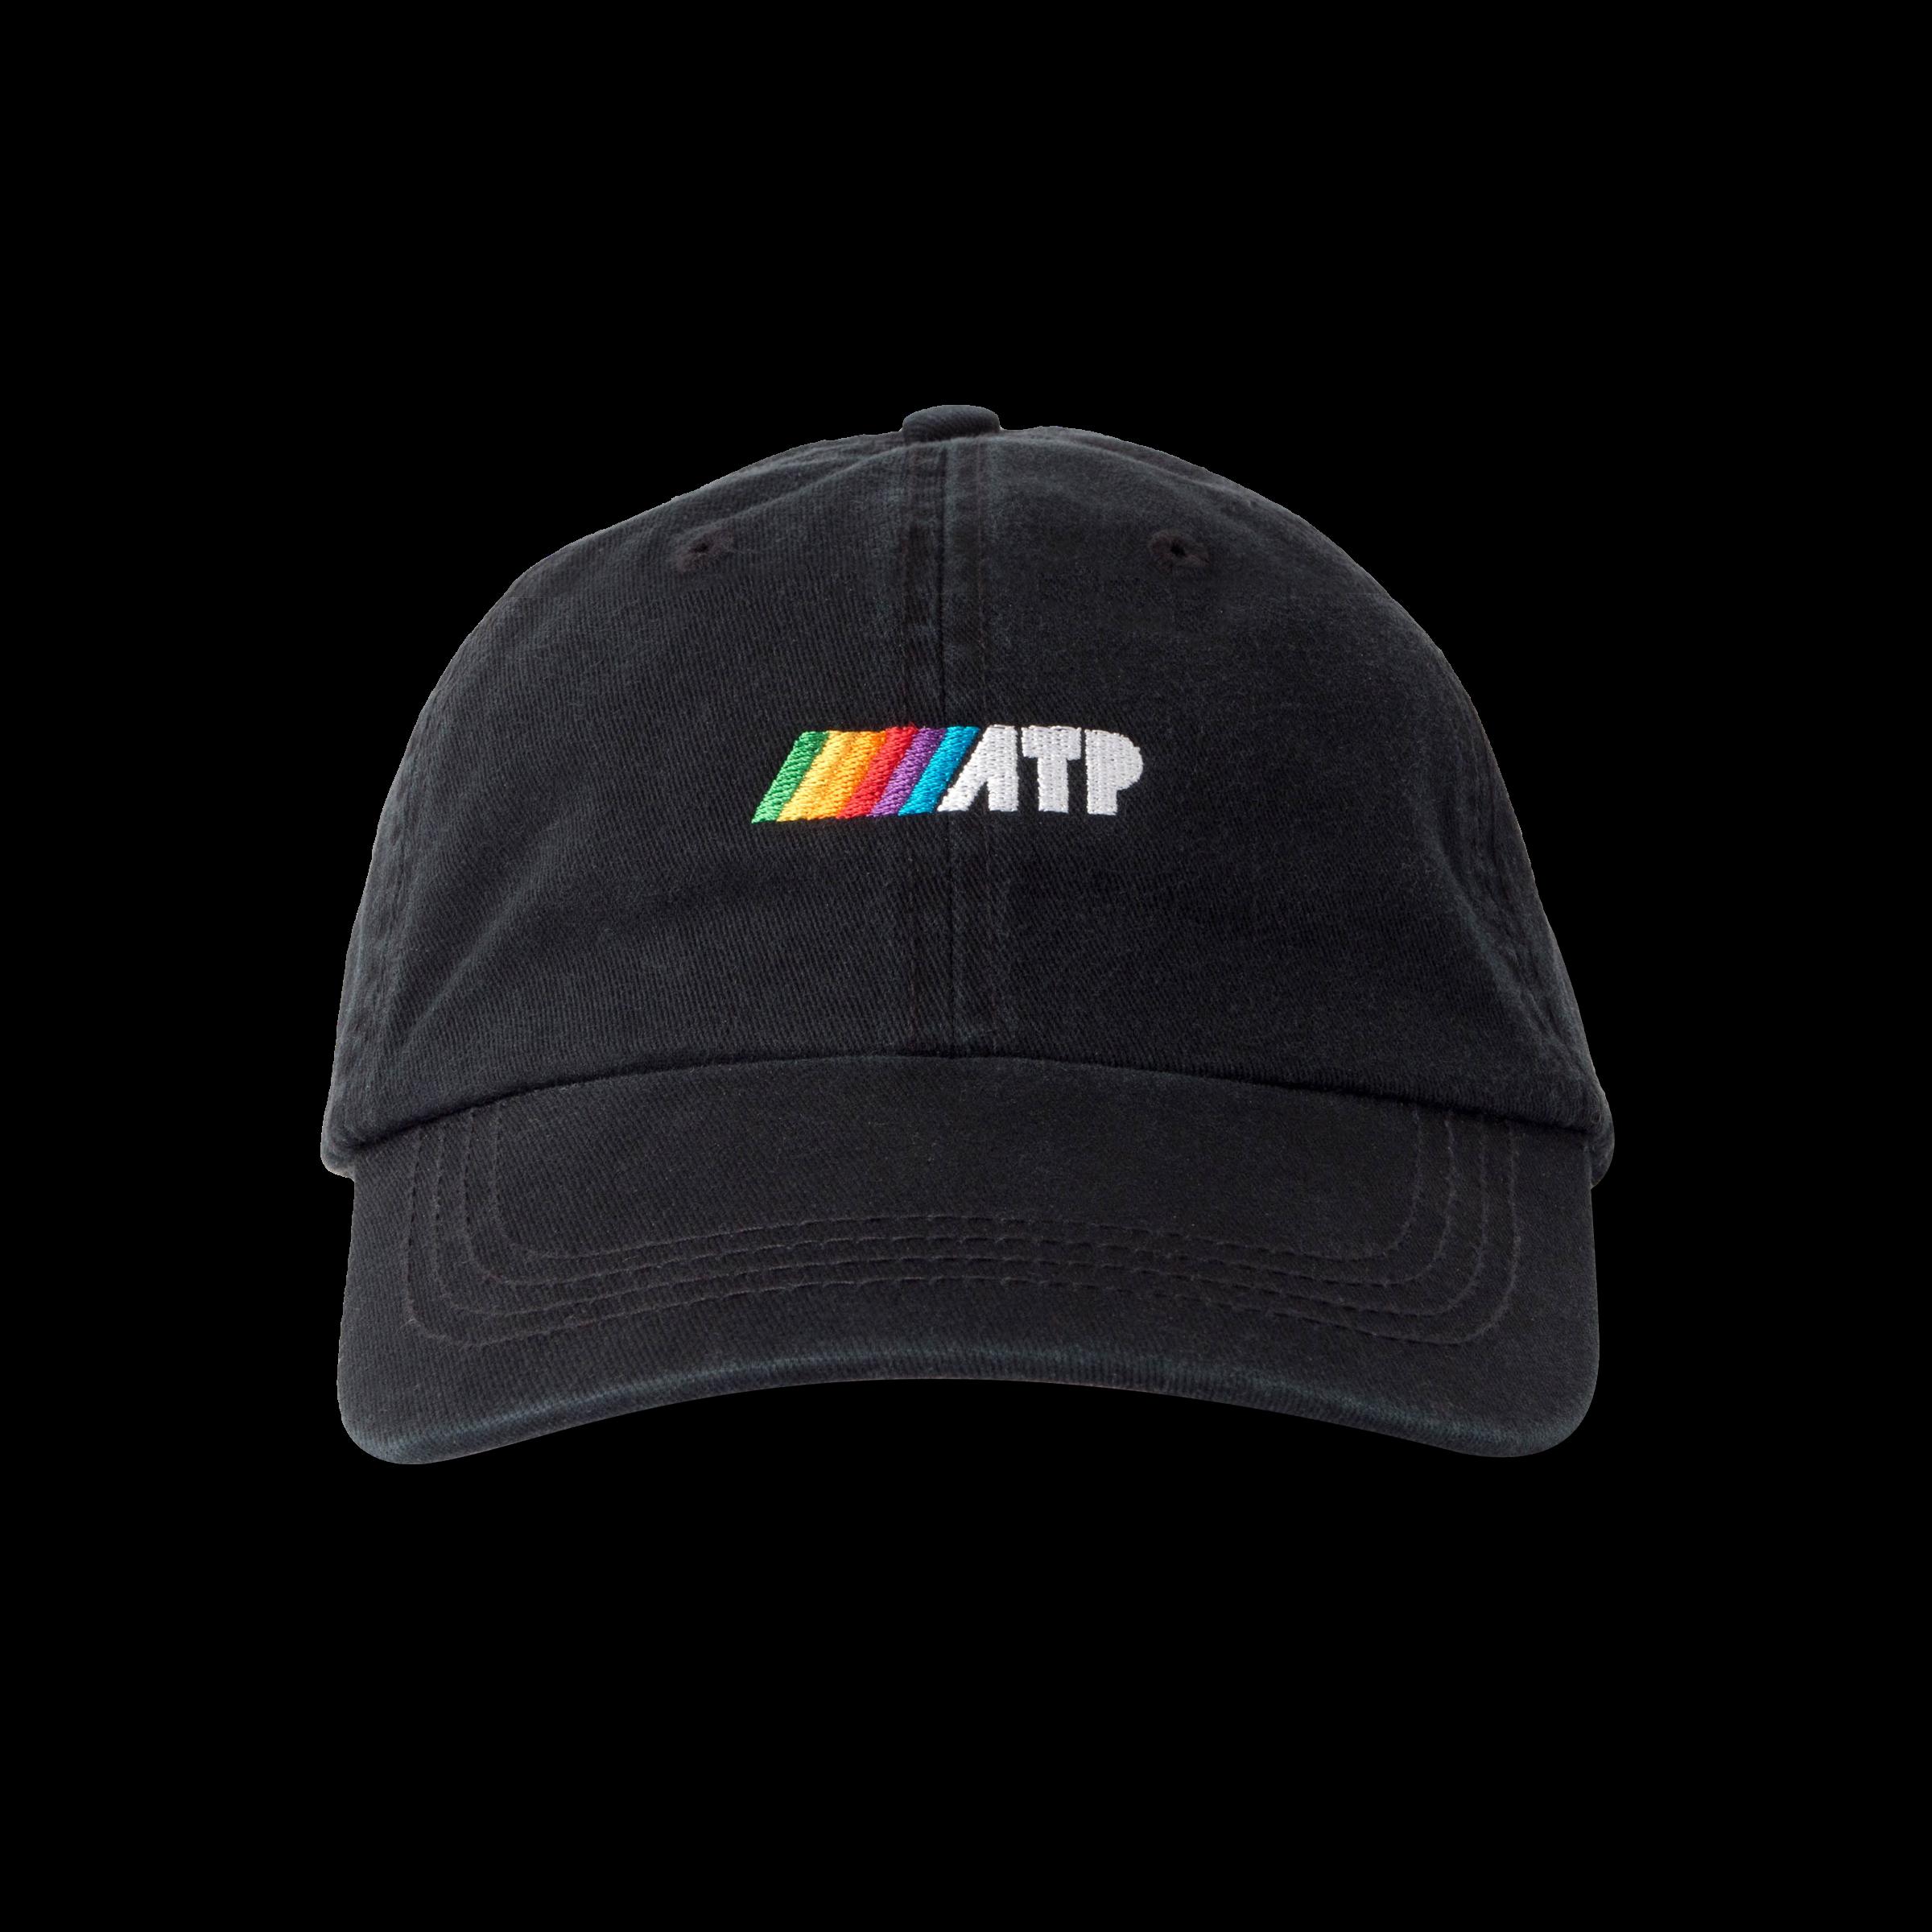 ///ATP Dad Hat